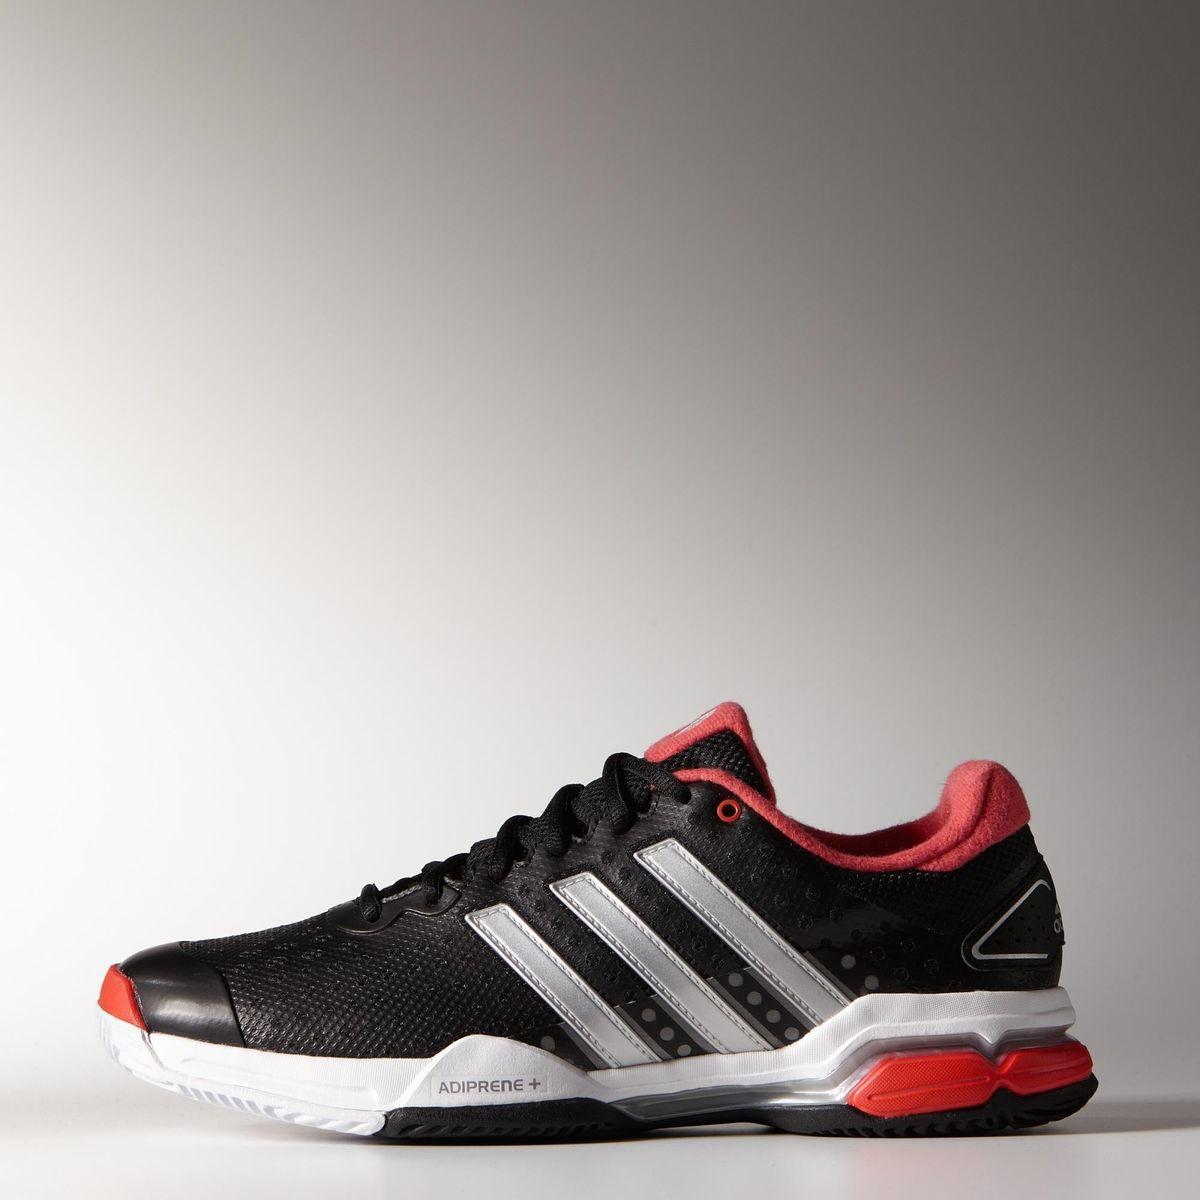 sports shoes 4a48d 0368c Adidas Mens Barricade Team 4 Tennis Shoes - Black Silver Red -  Tennisnuts.com